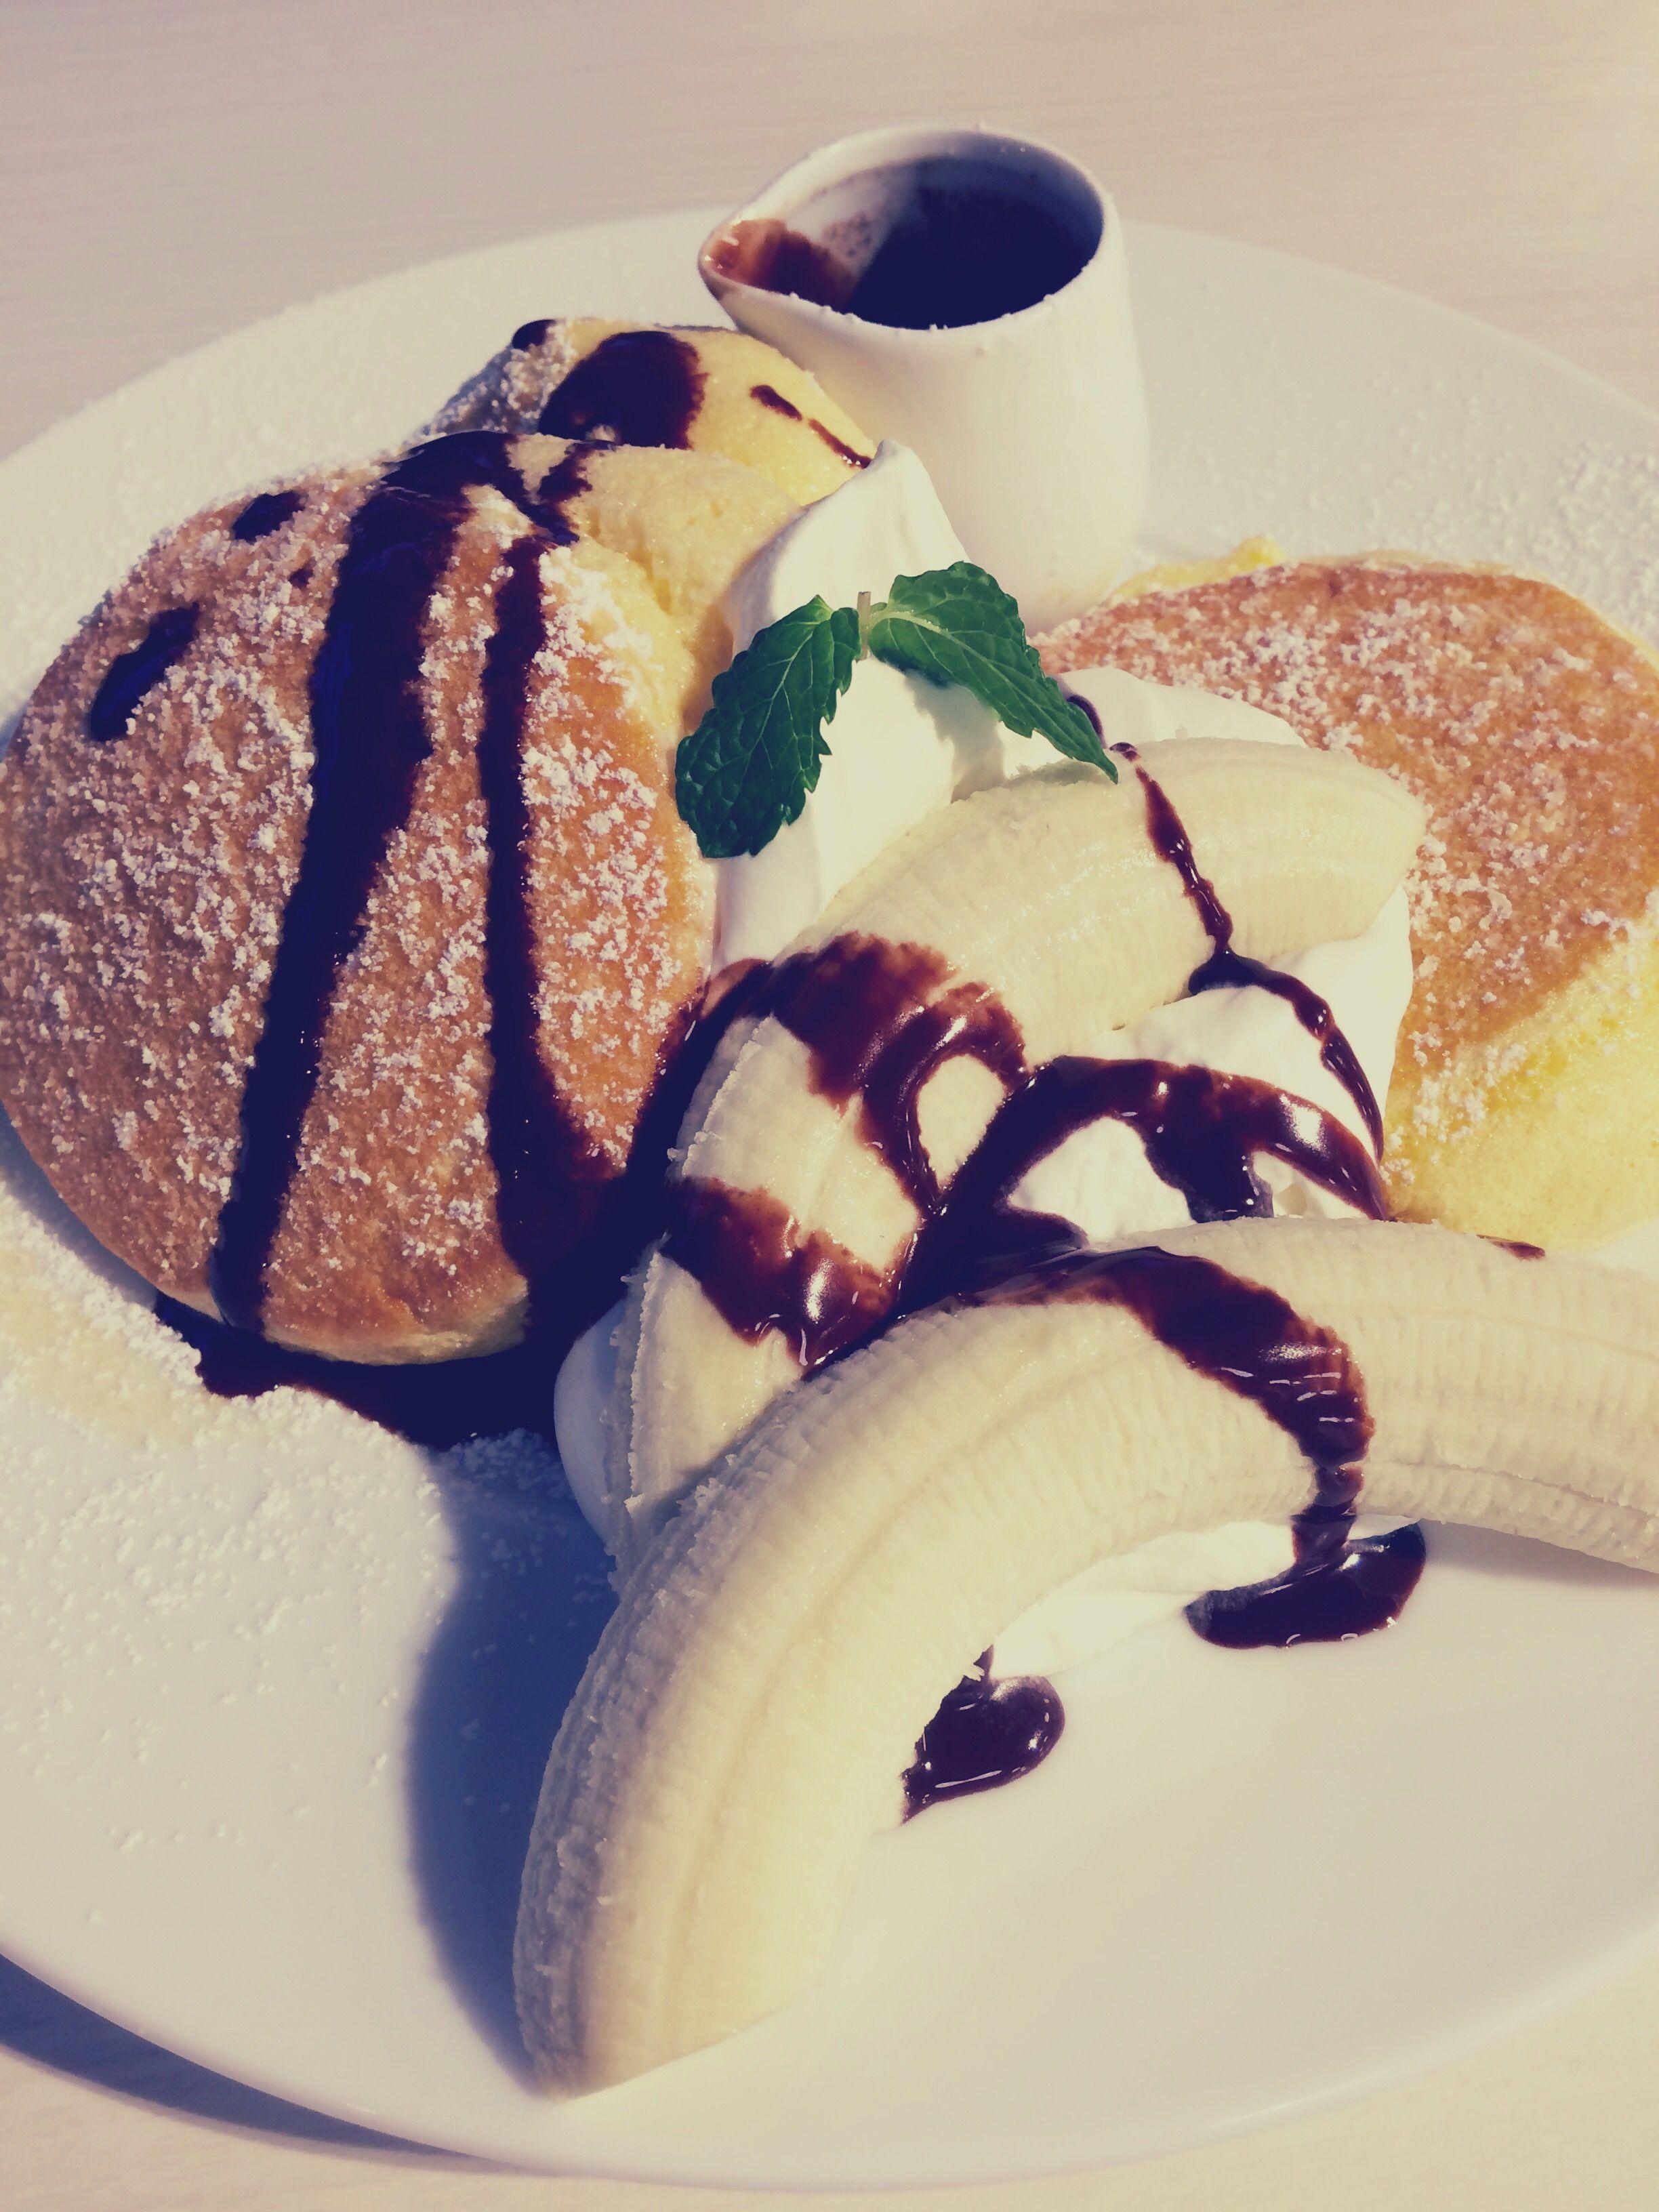 2016.11.21 GCT検査 幸せのパンケーキのバナナチョコパンケーキ